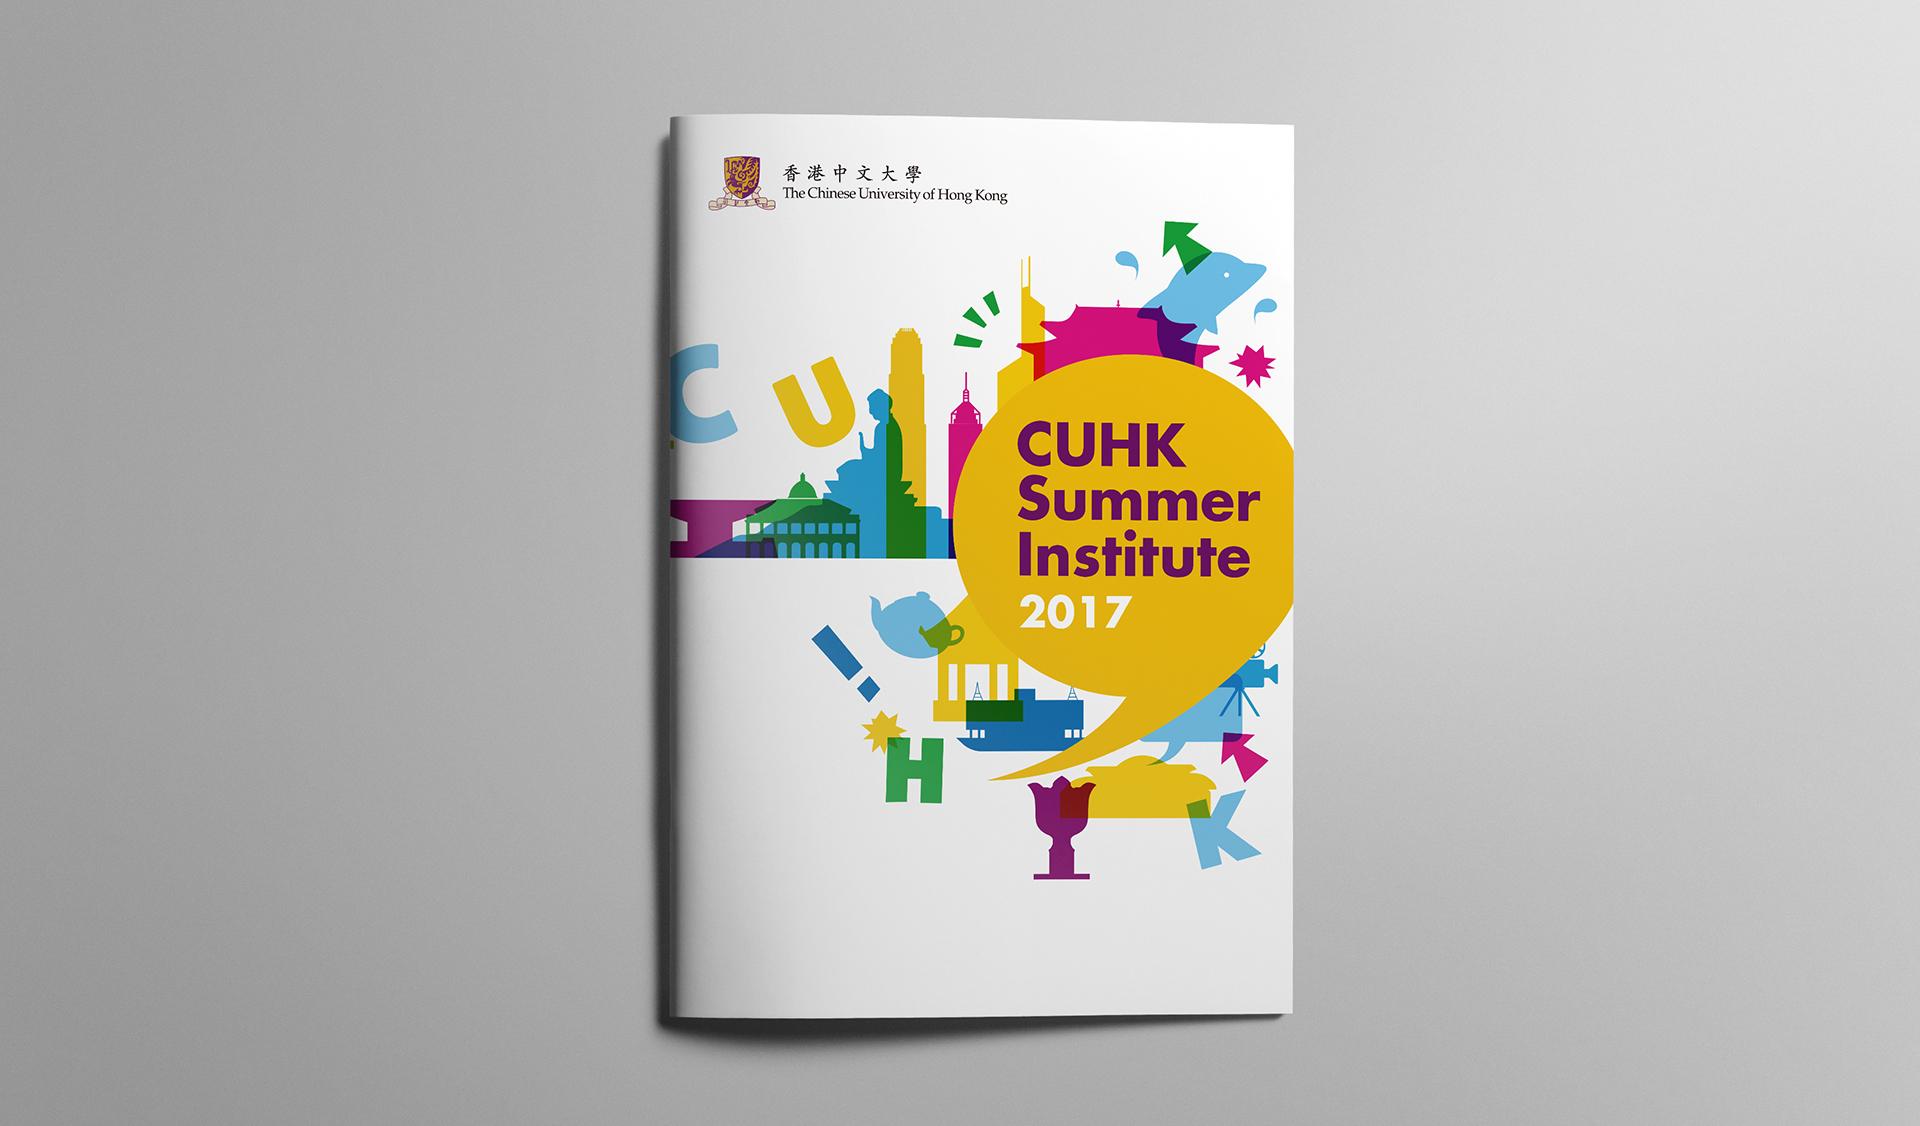 CUHK OAL Summer Institute 2017